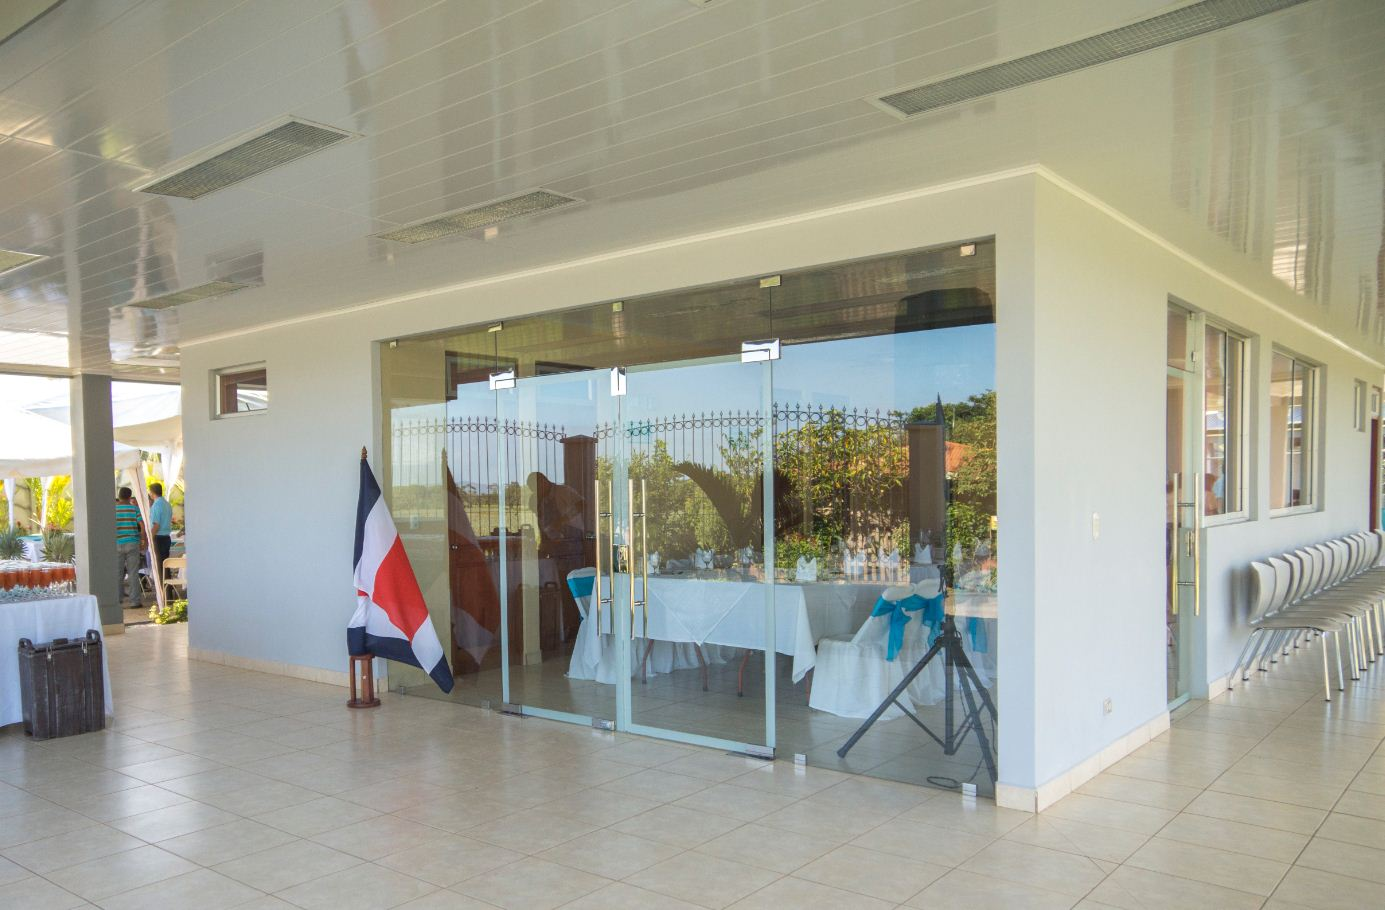 Finca Corsicana's Community Center